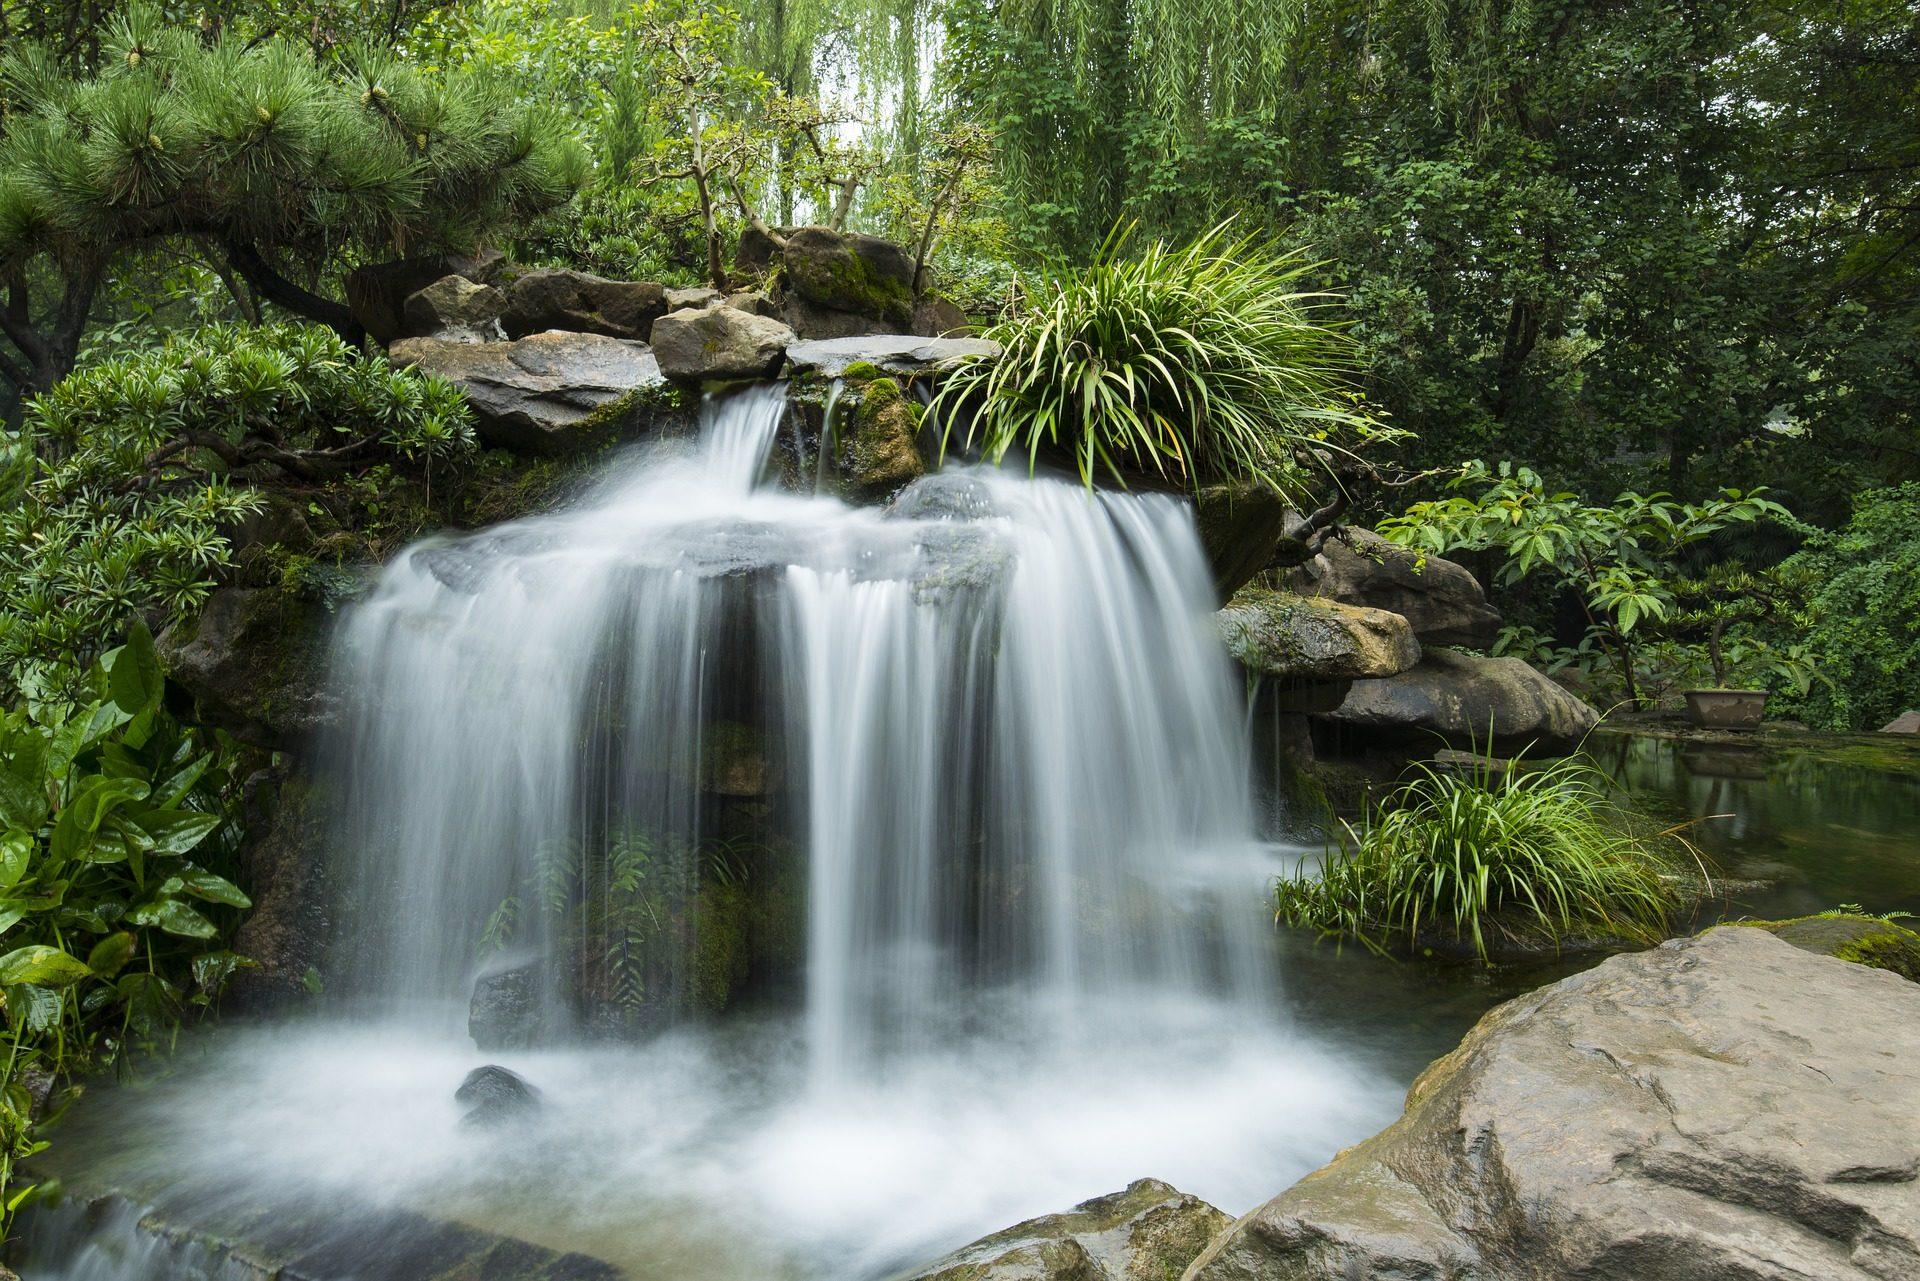 Fondo de pantalla de jard n r o cascada fuente plantas for Estanques con cascadas de piedra